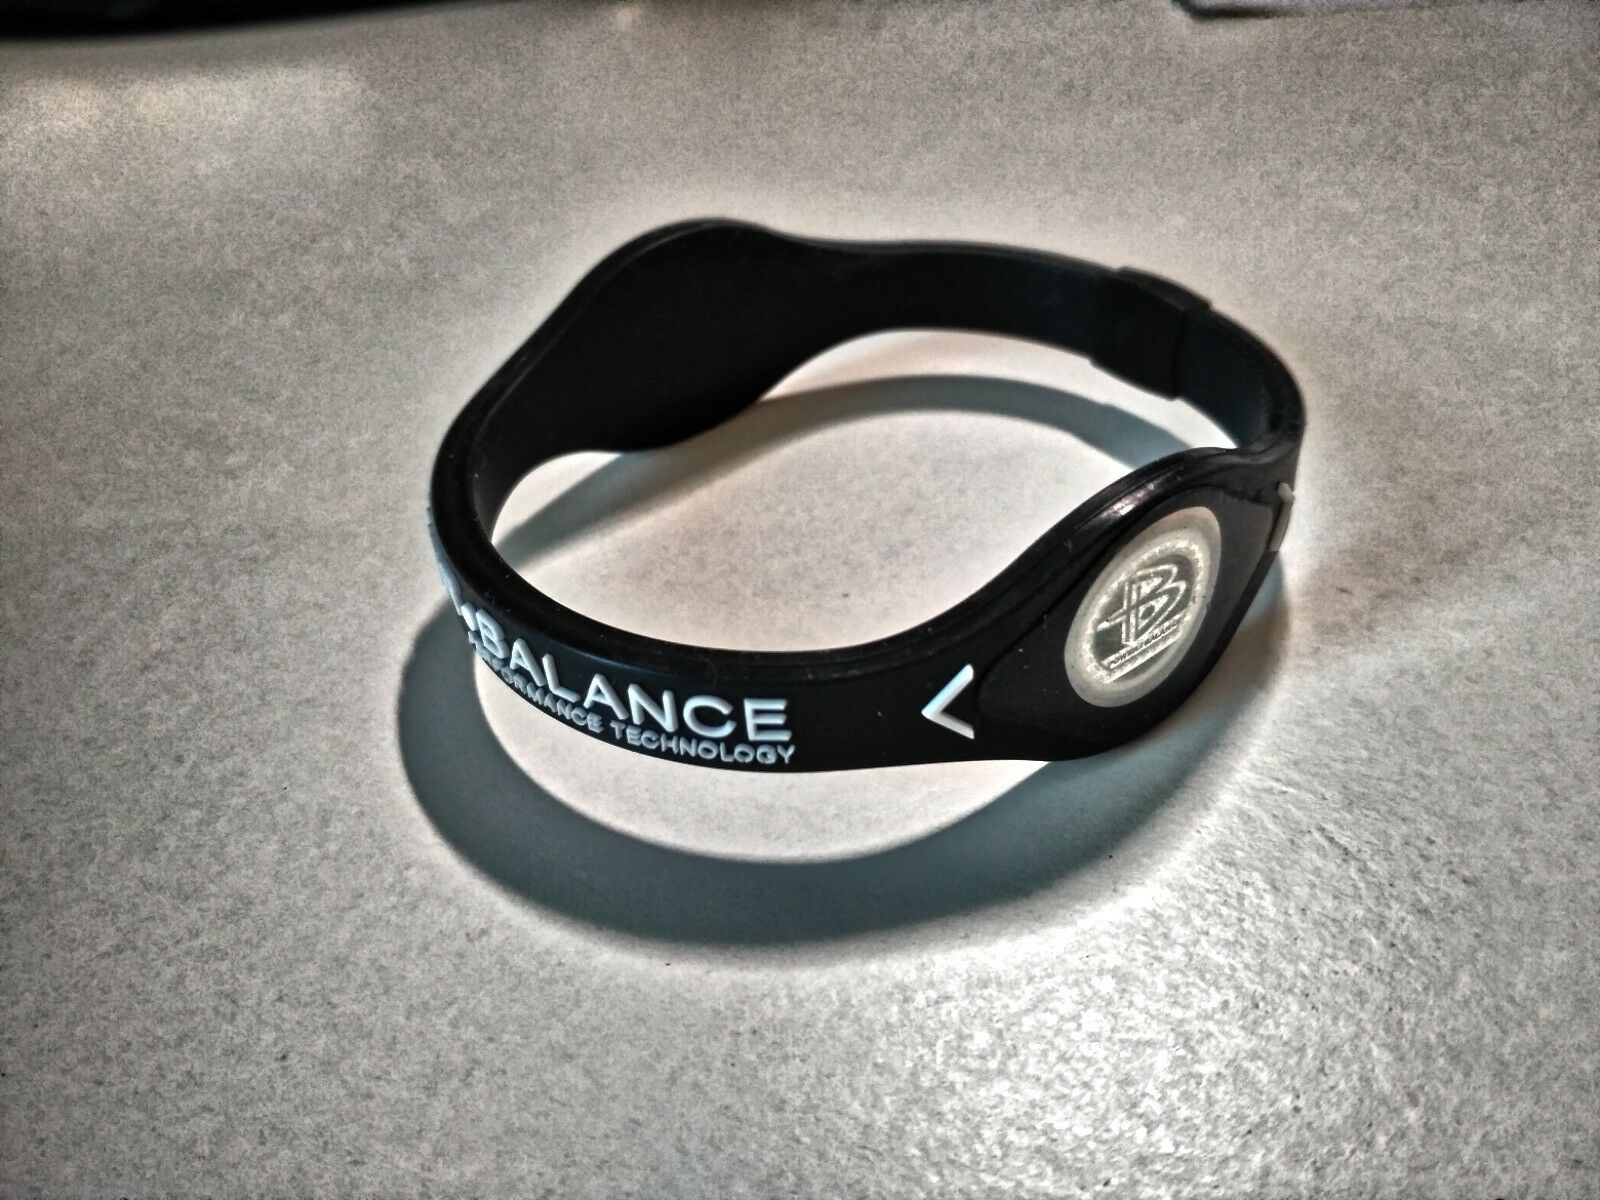 Power Balance Silikon Energie Band, Fitness Armband, Hologramm, Ionenband, Gr. S